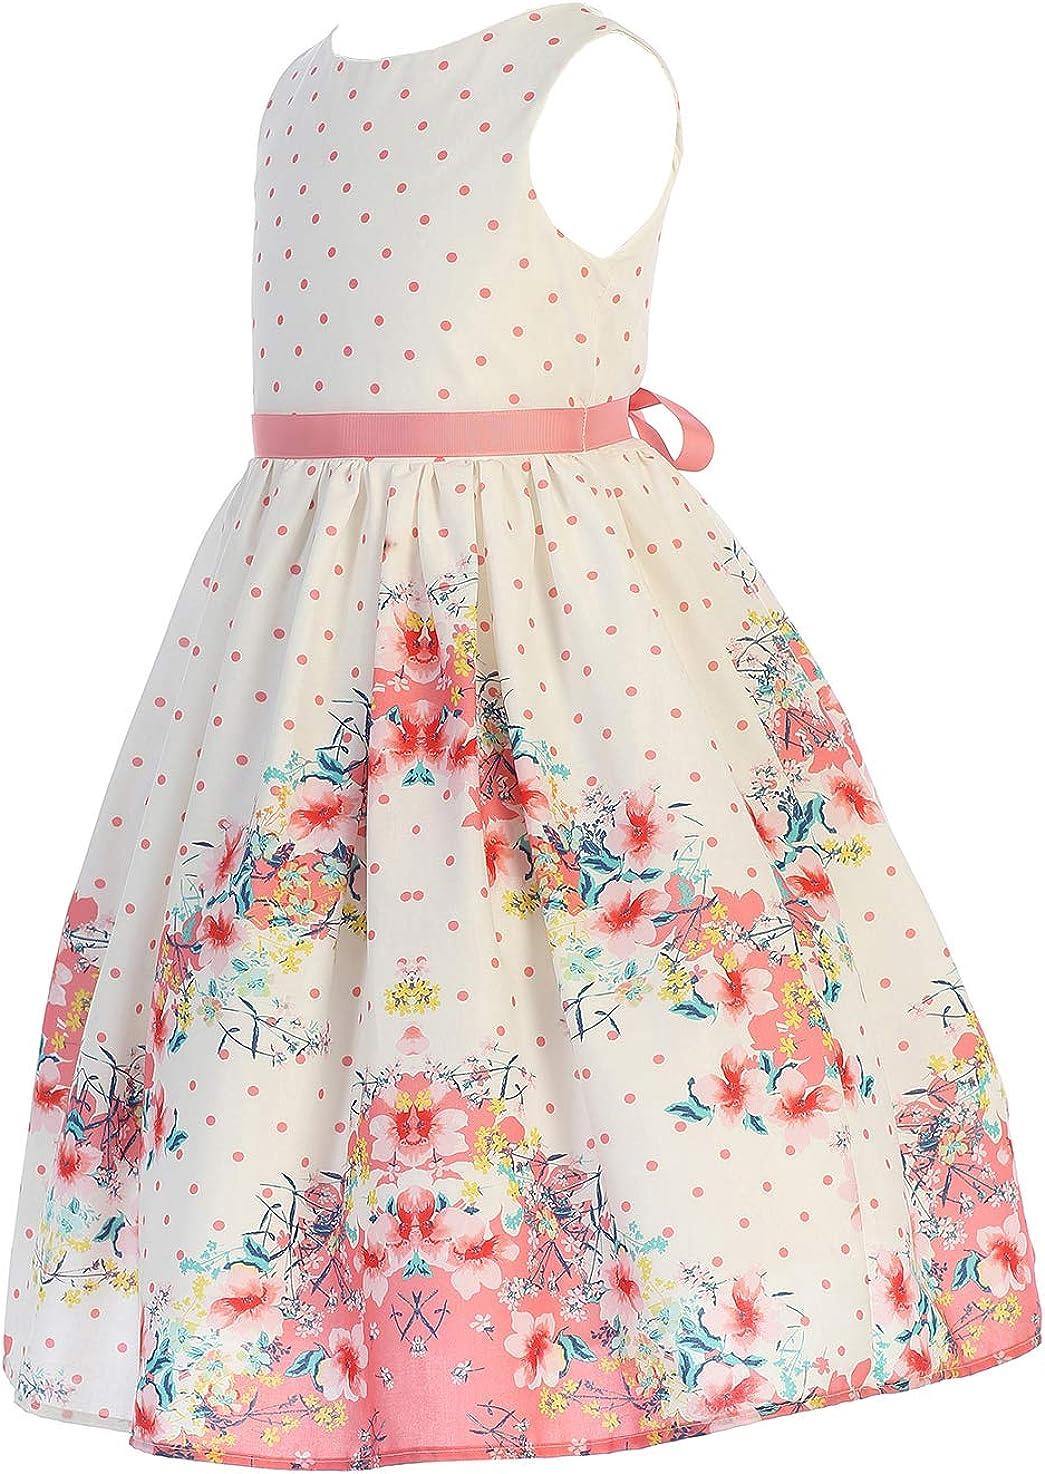 iGirlDress Little Girls Butterfly Burnout Organza/Cotton Easter Dress USA size2-12